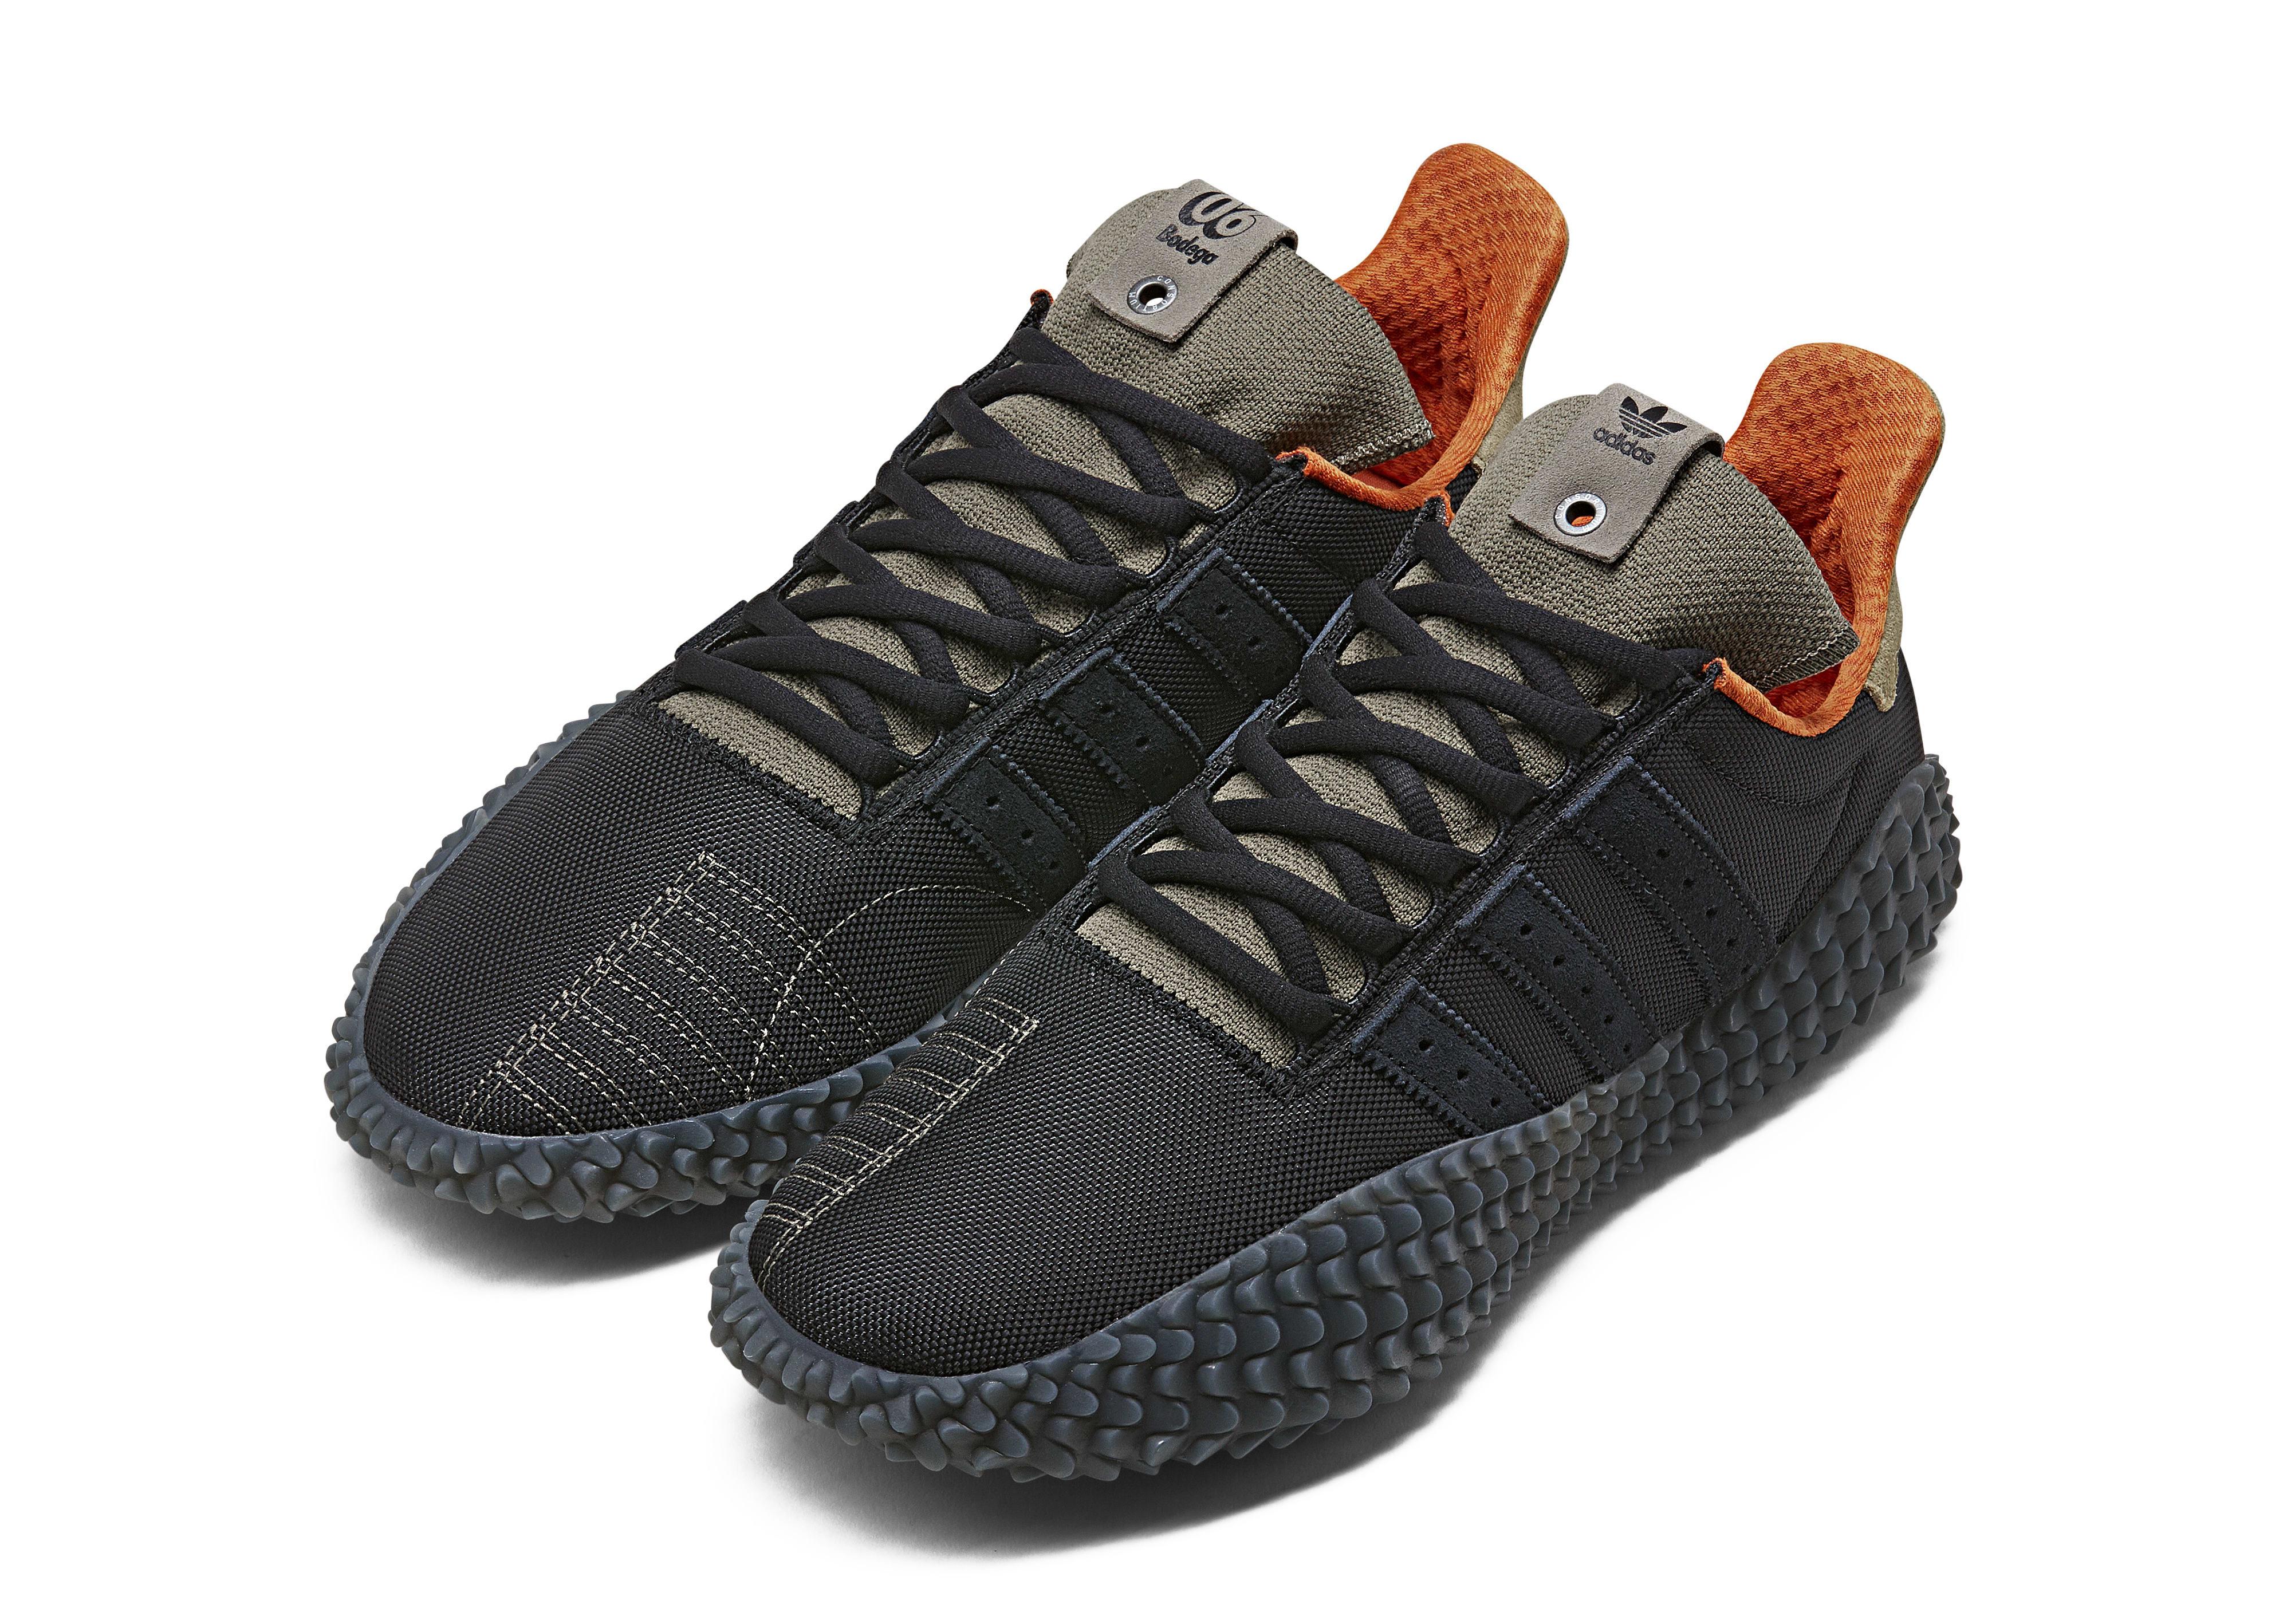 Bodega x Adidas Kamanda BB9243 (Pair)